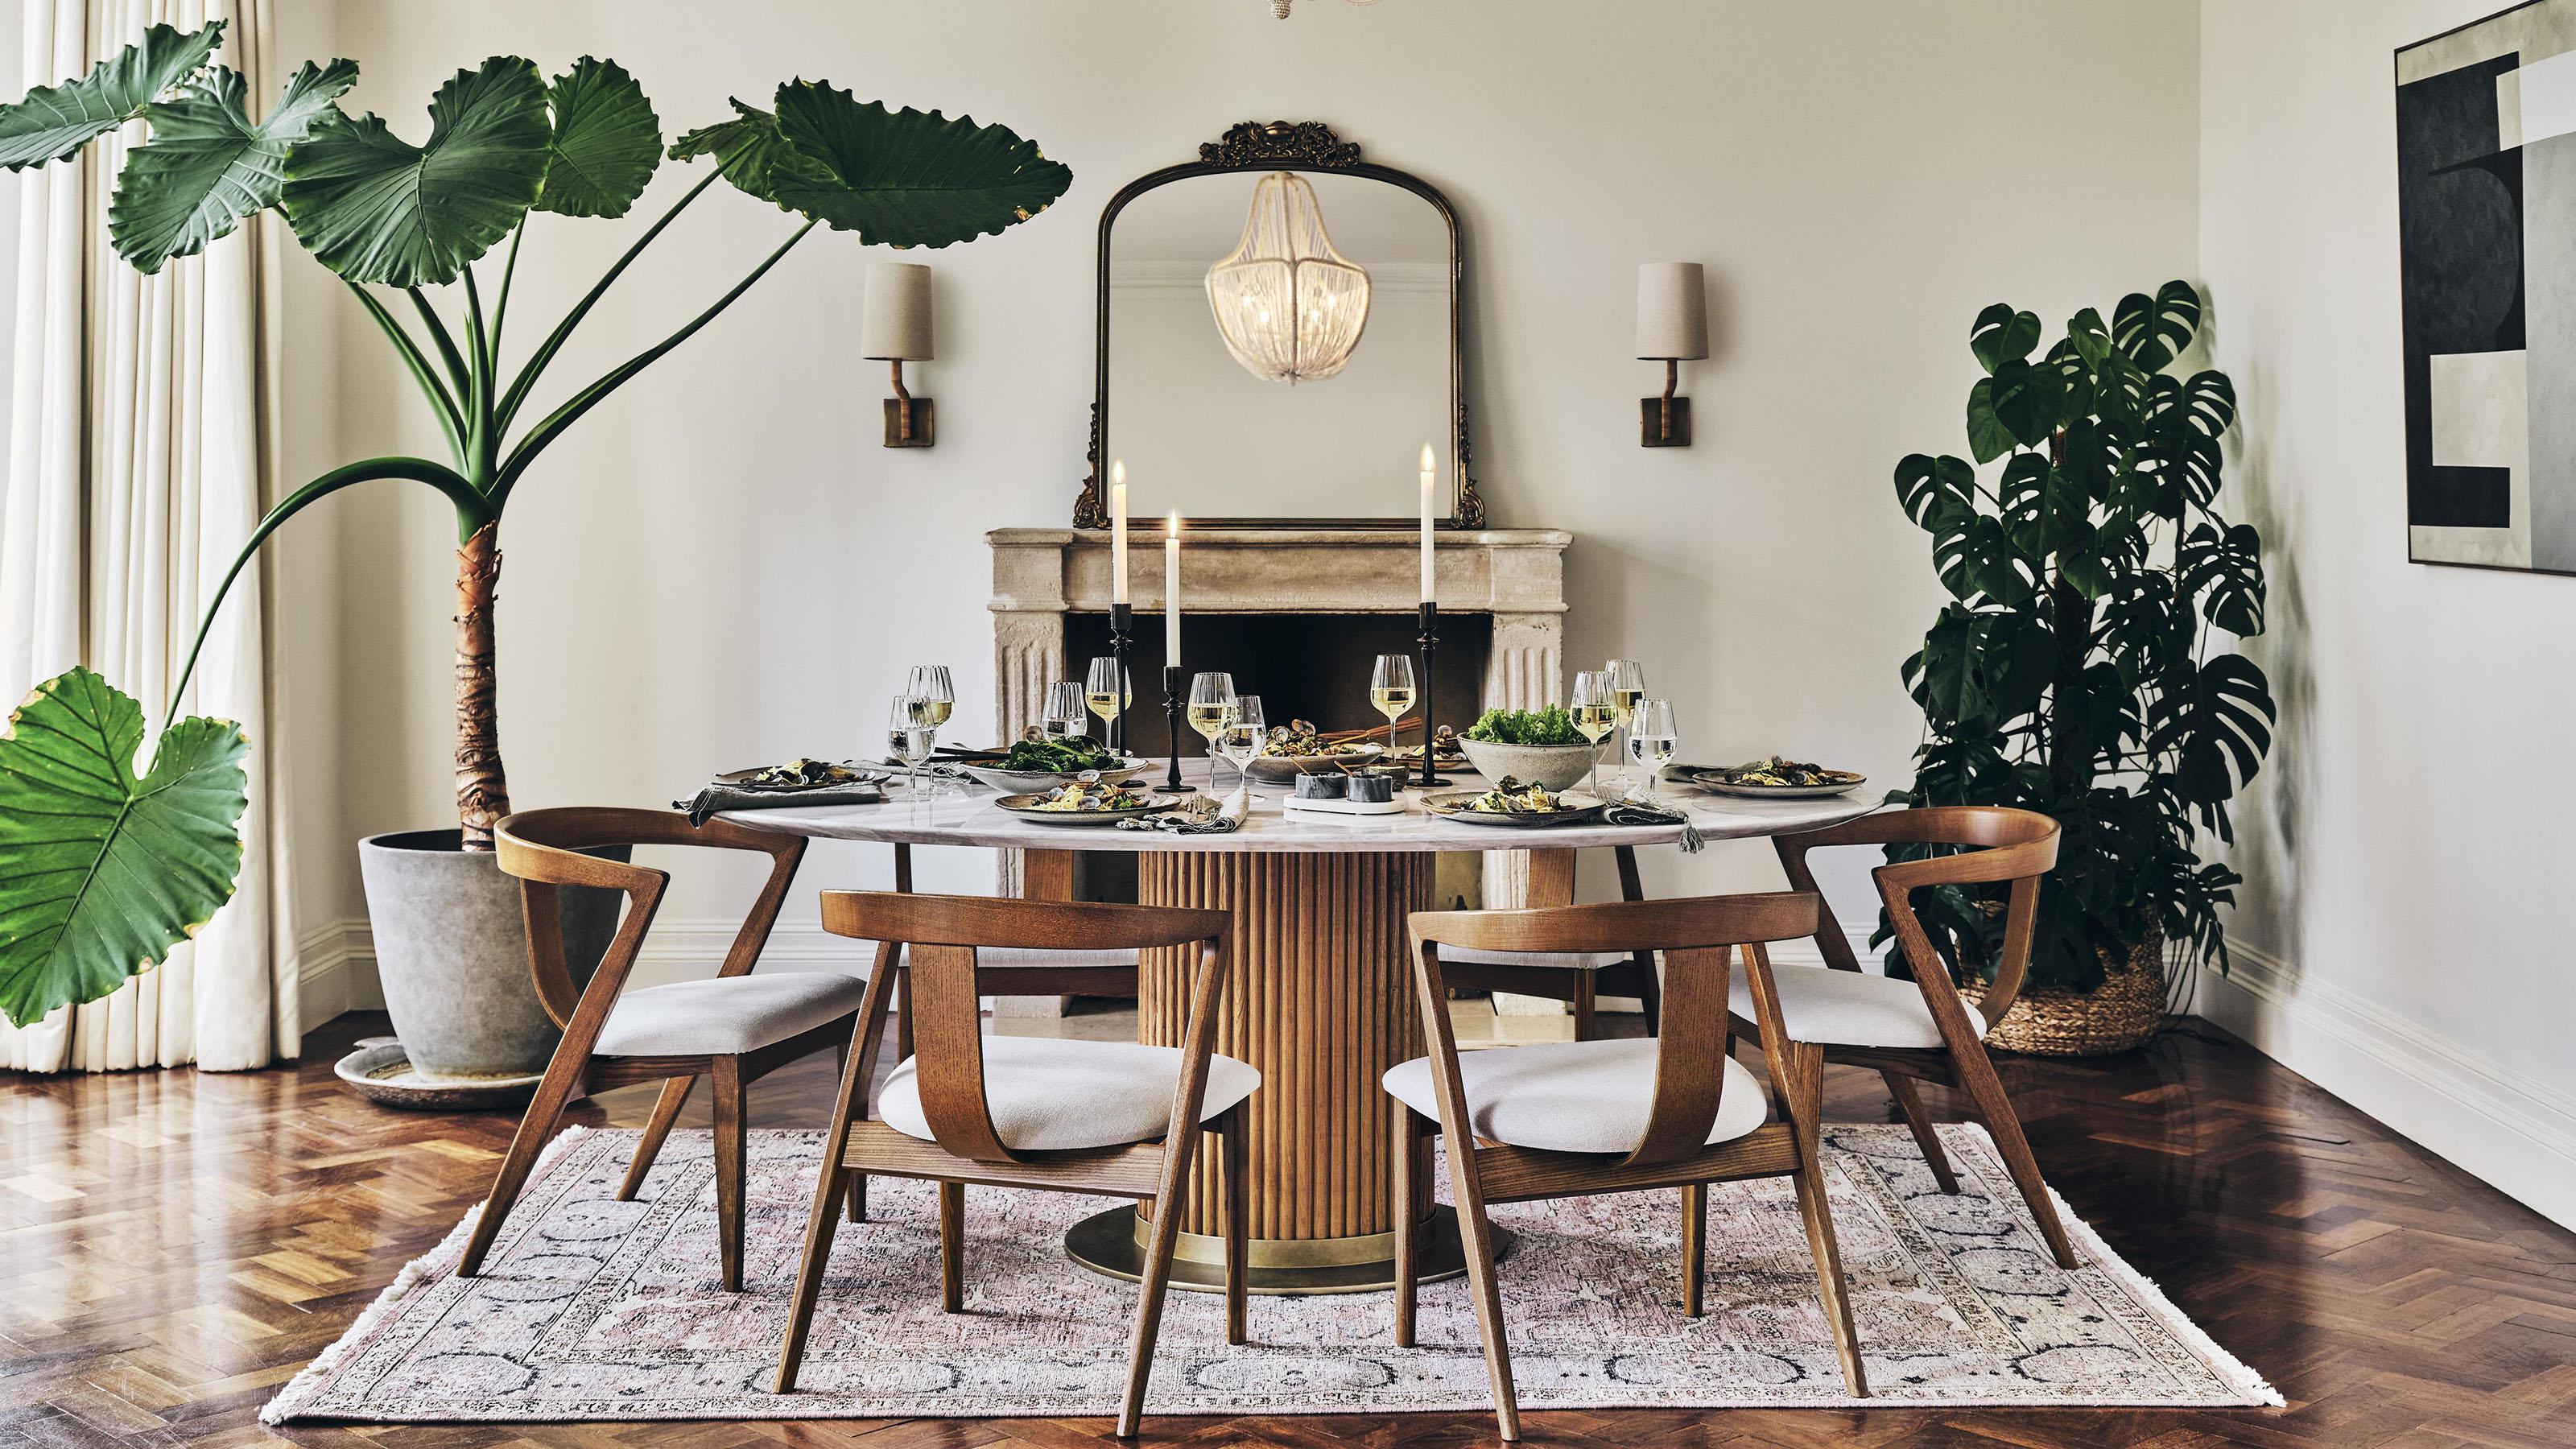 25 Dining Room Ideas Trends Styles, Dining Room Inspiration